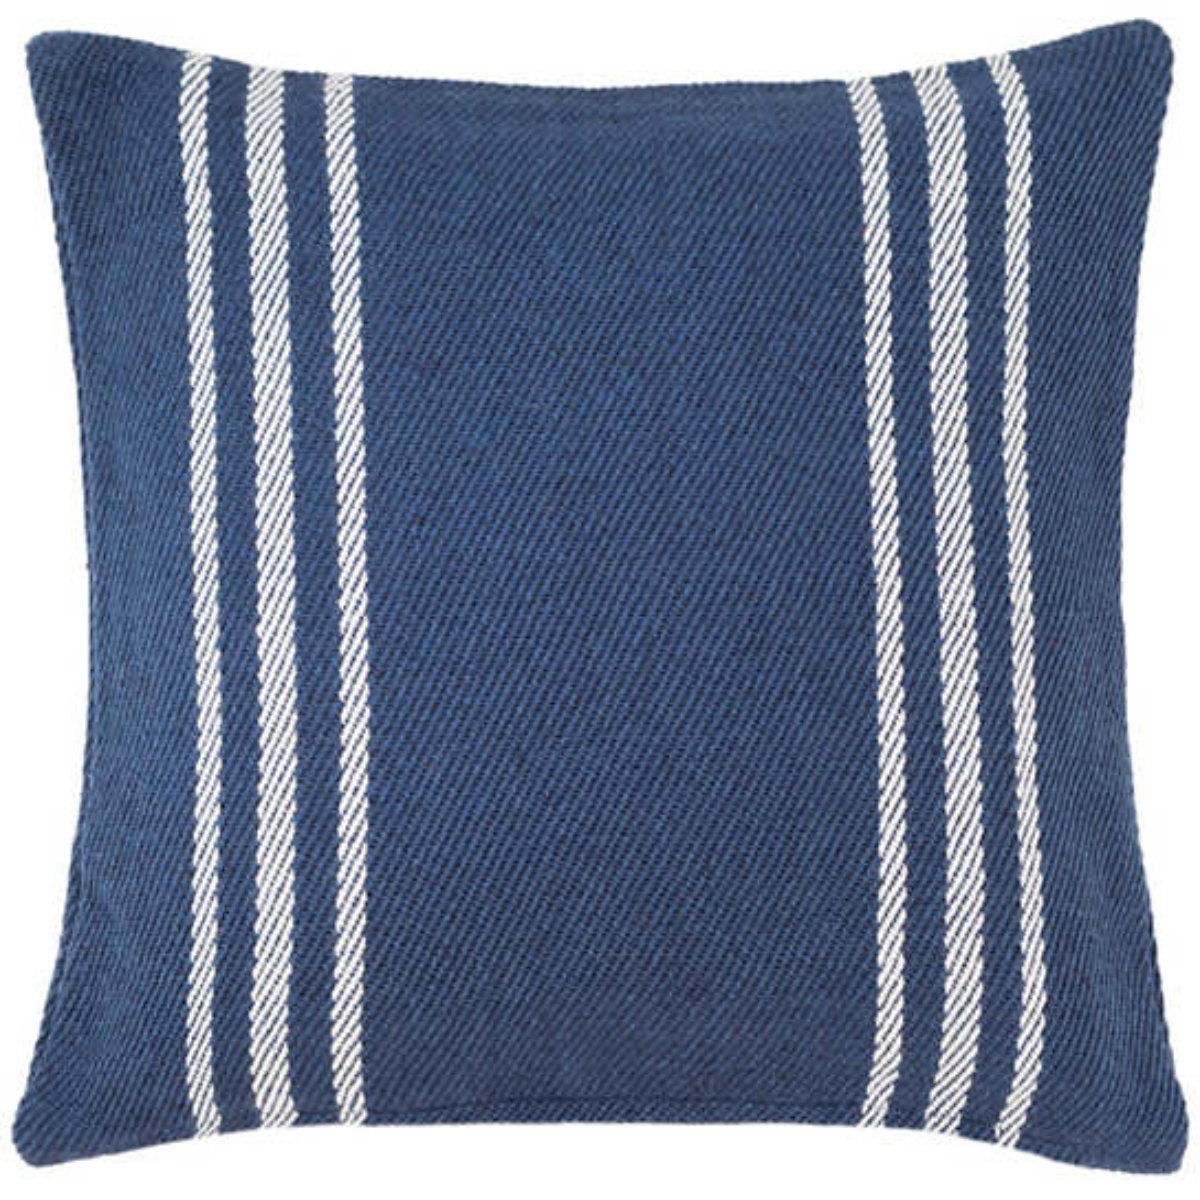 Lexington Navy White Indoor Outdoor Pillow Fresh American